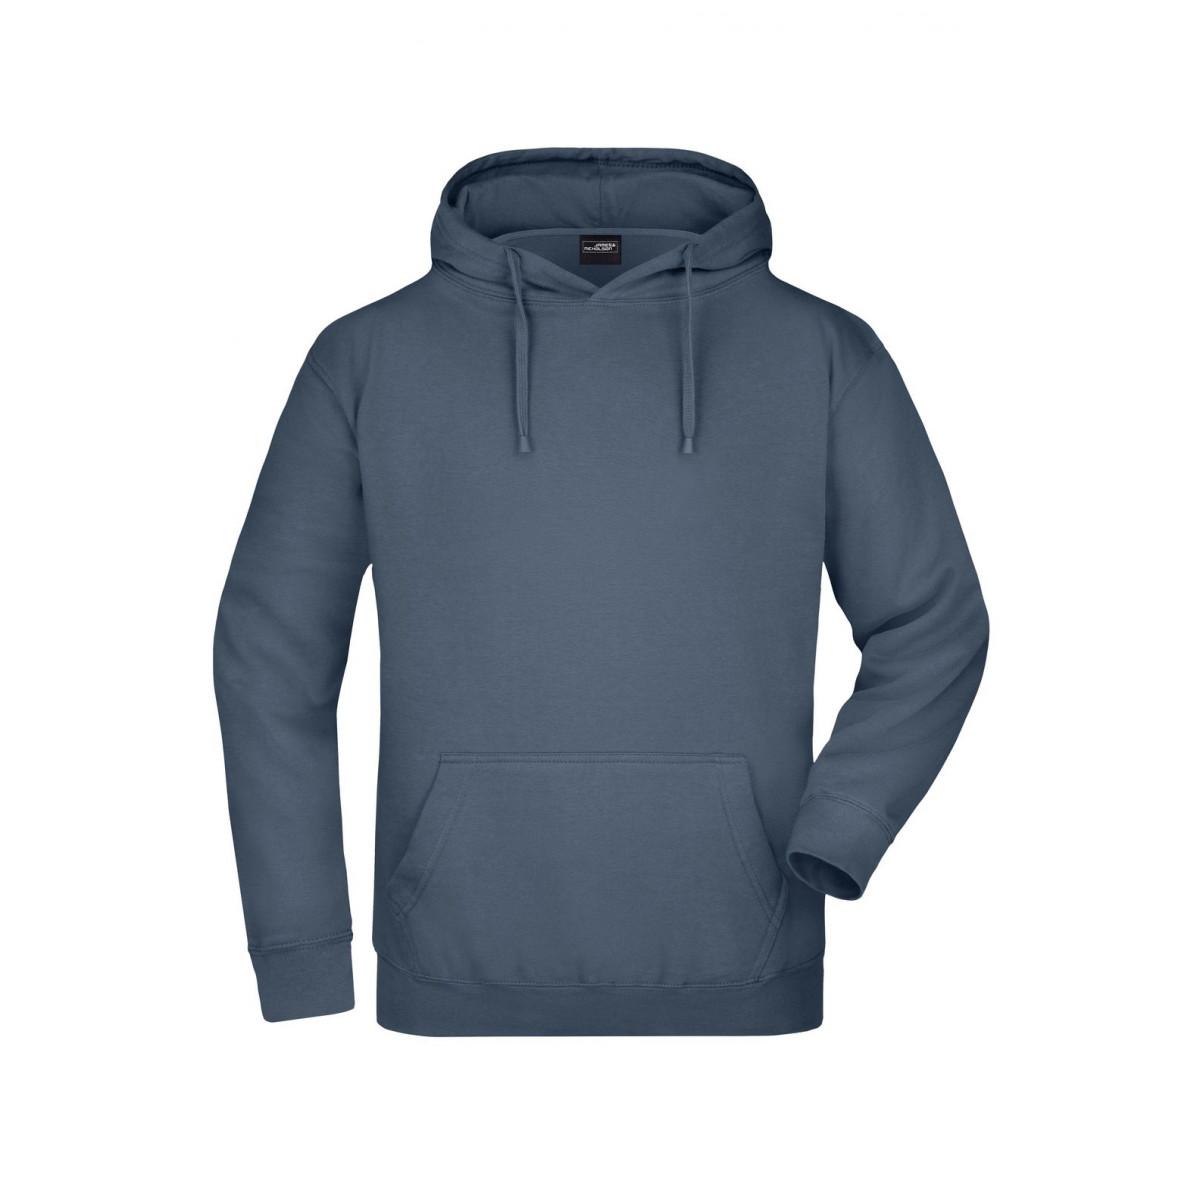 Толстовка мужская JN047 Hooded Sweat - Карбон